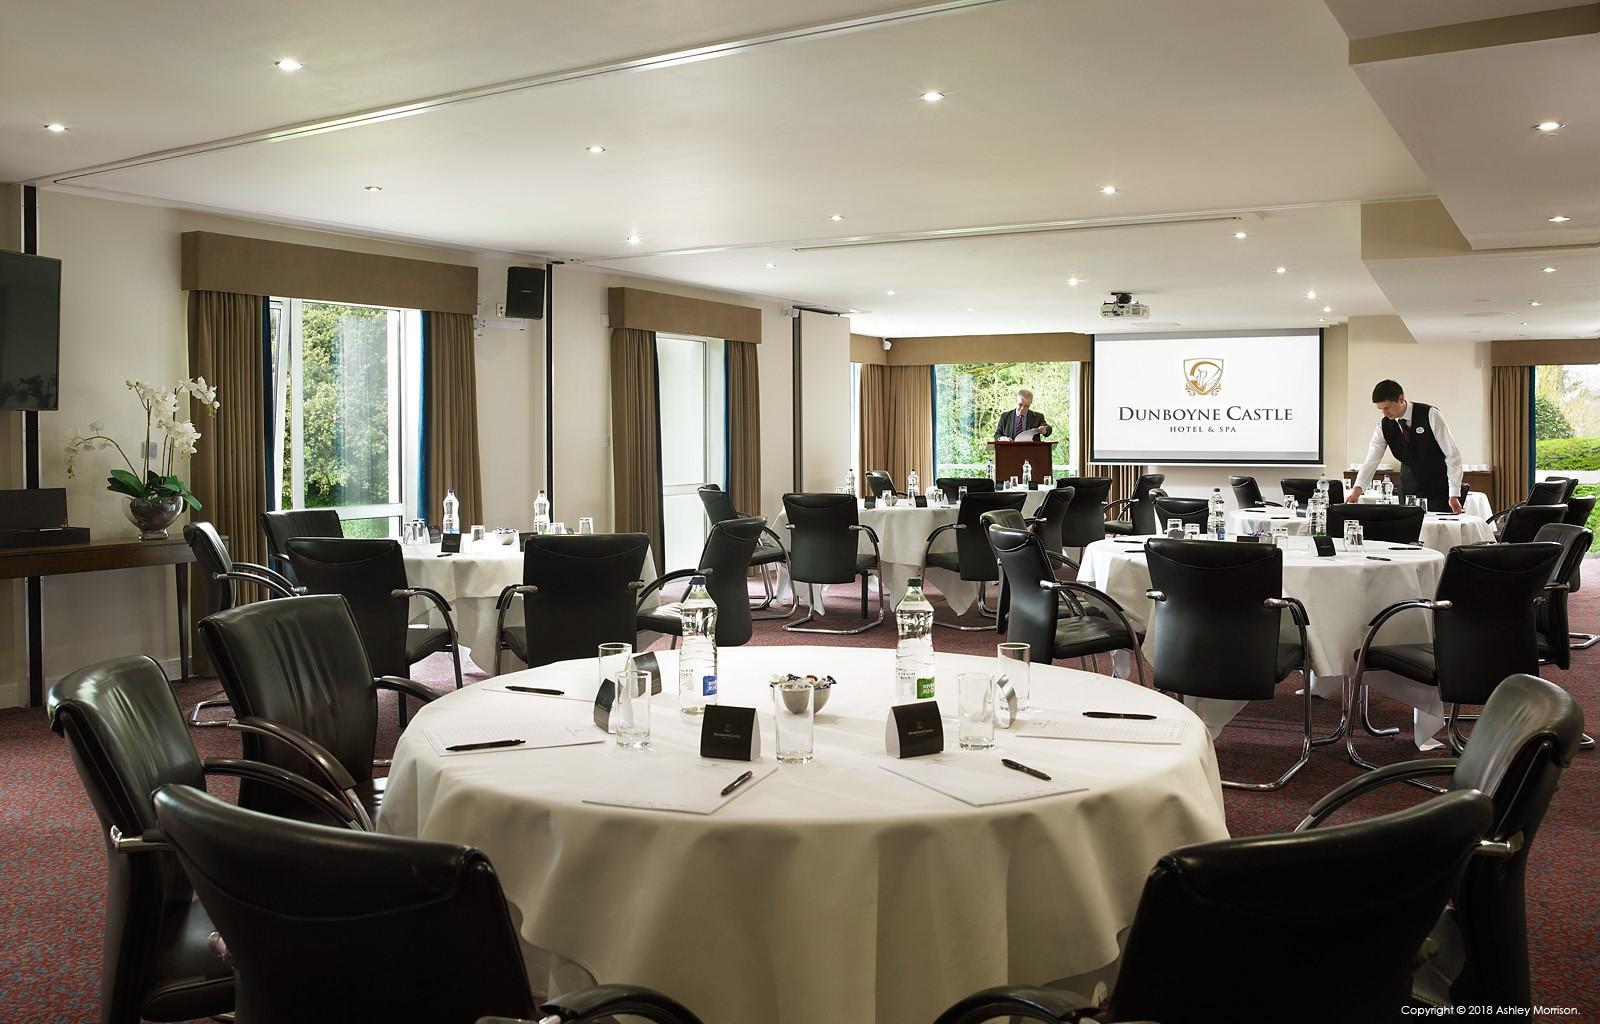 Conference Venue Near Dublin Dunboyne Castle Hotel In Co